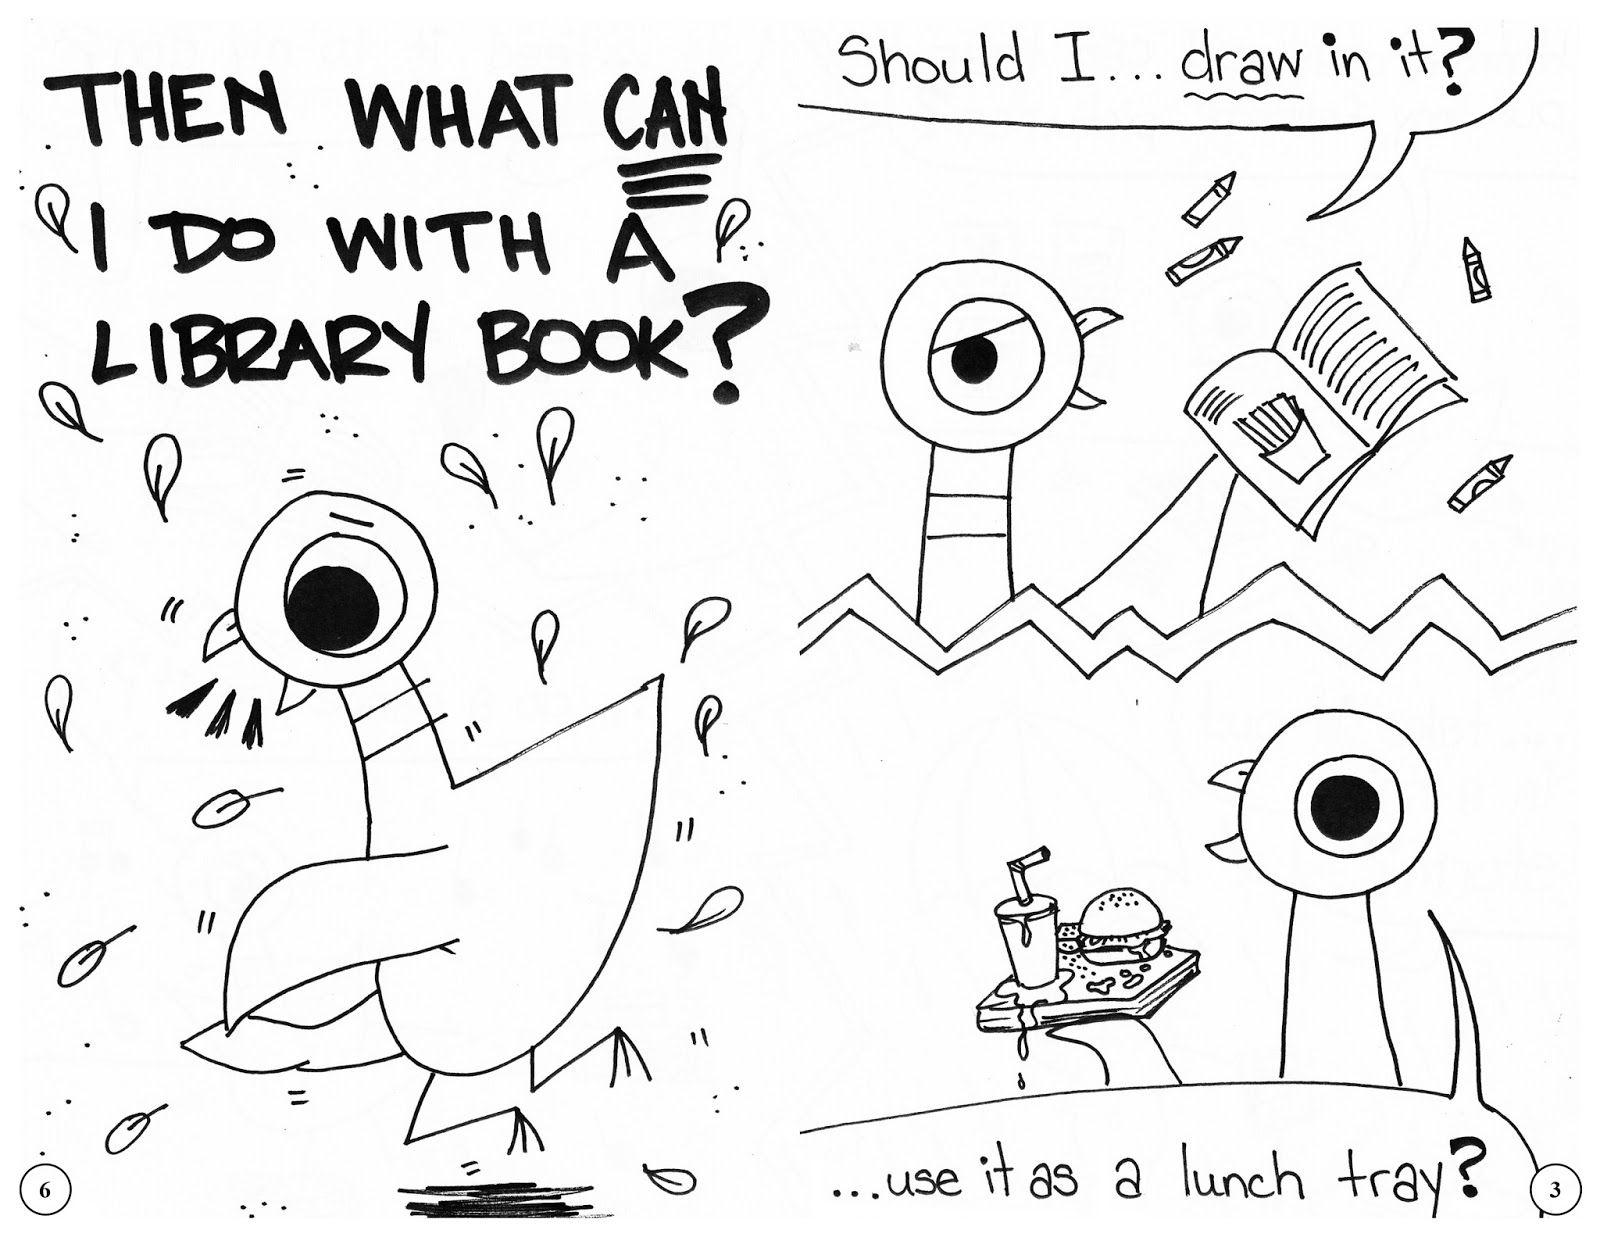 4 Bp Blogspot Com Cur8ztwdwui Vri4nysv6fi Aaaaaaaays4 Jdp25lo 9ye S1600 Pigeon 2bbook 2bpg 2b6 2ban Library Skills Kindergarten Library School Library Lessons